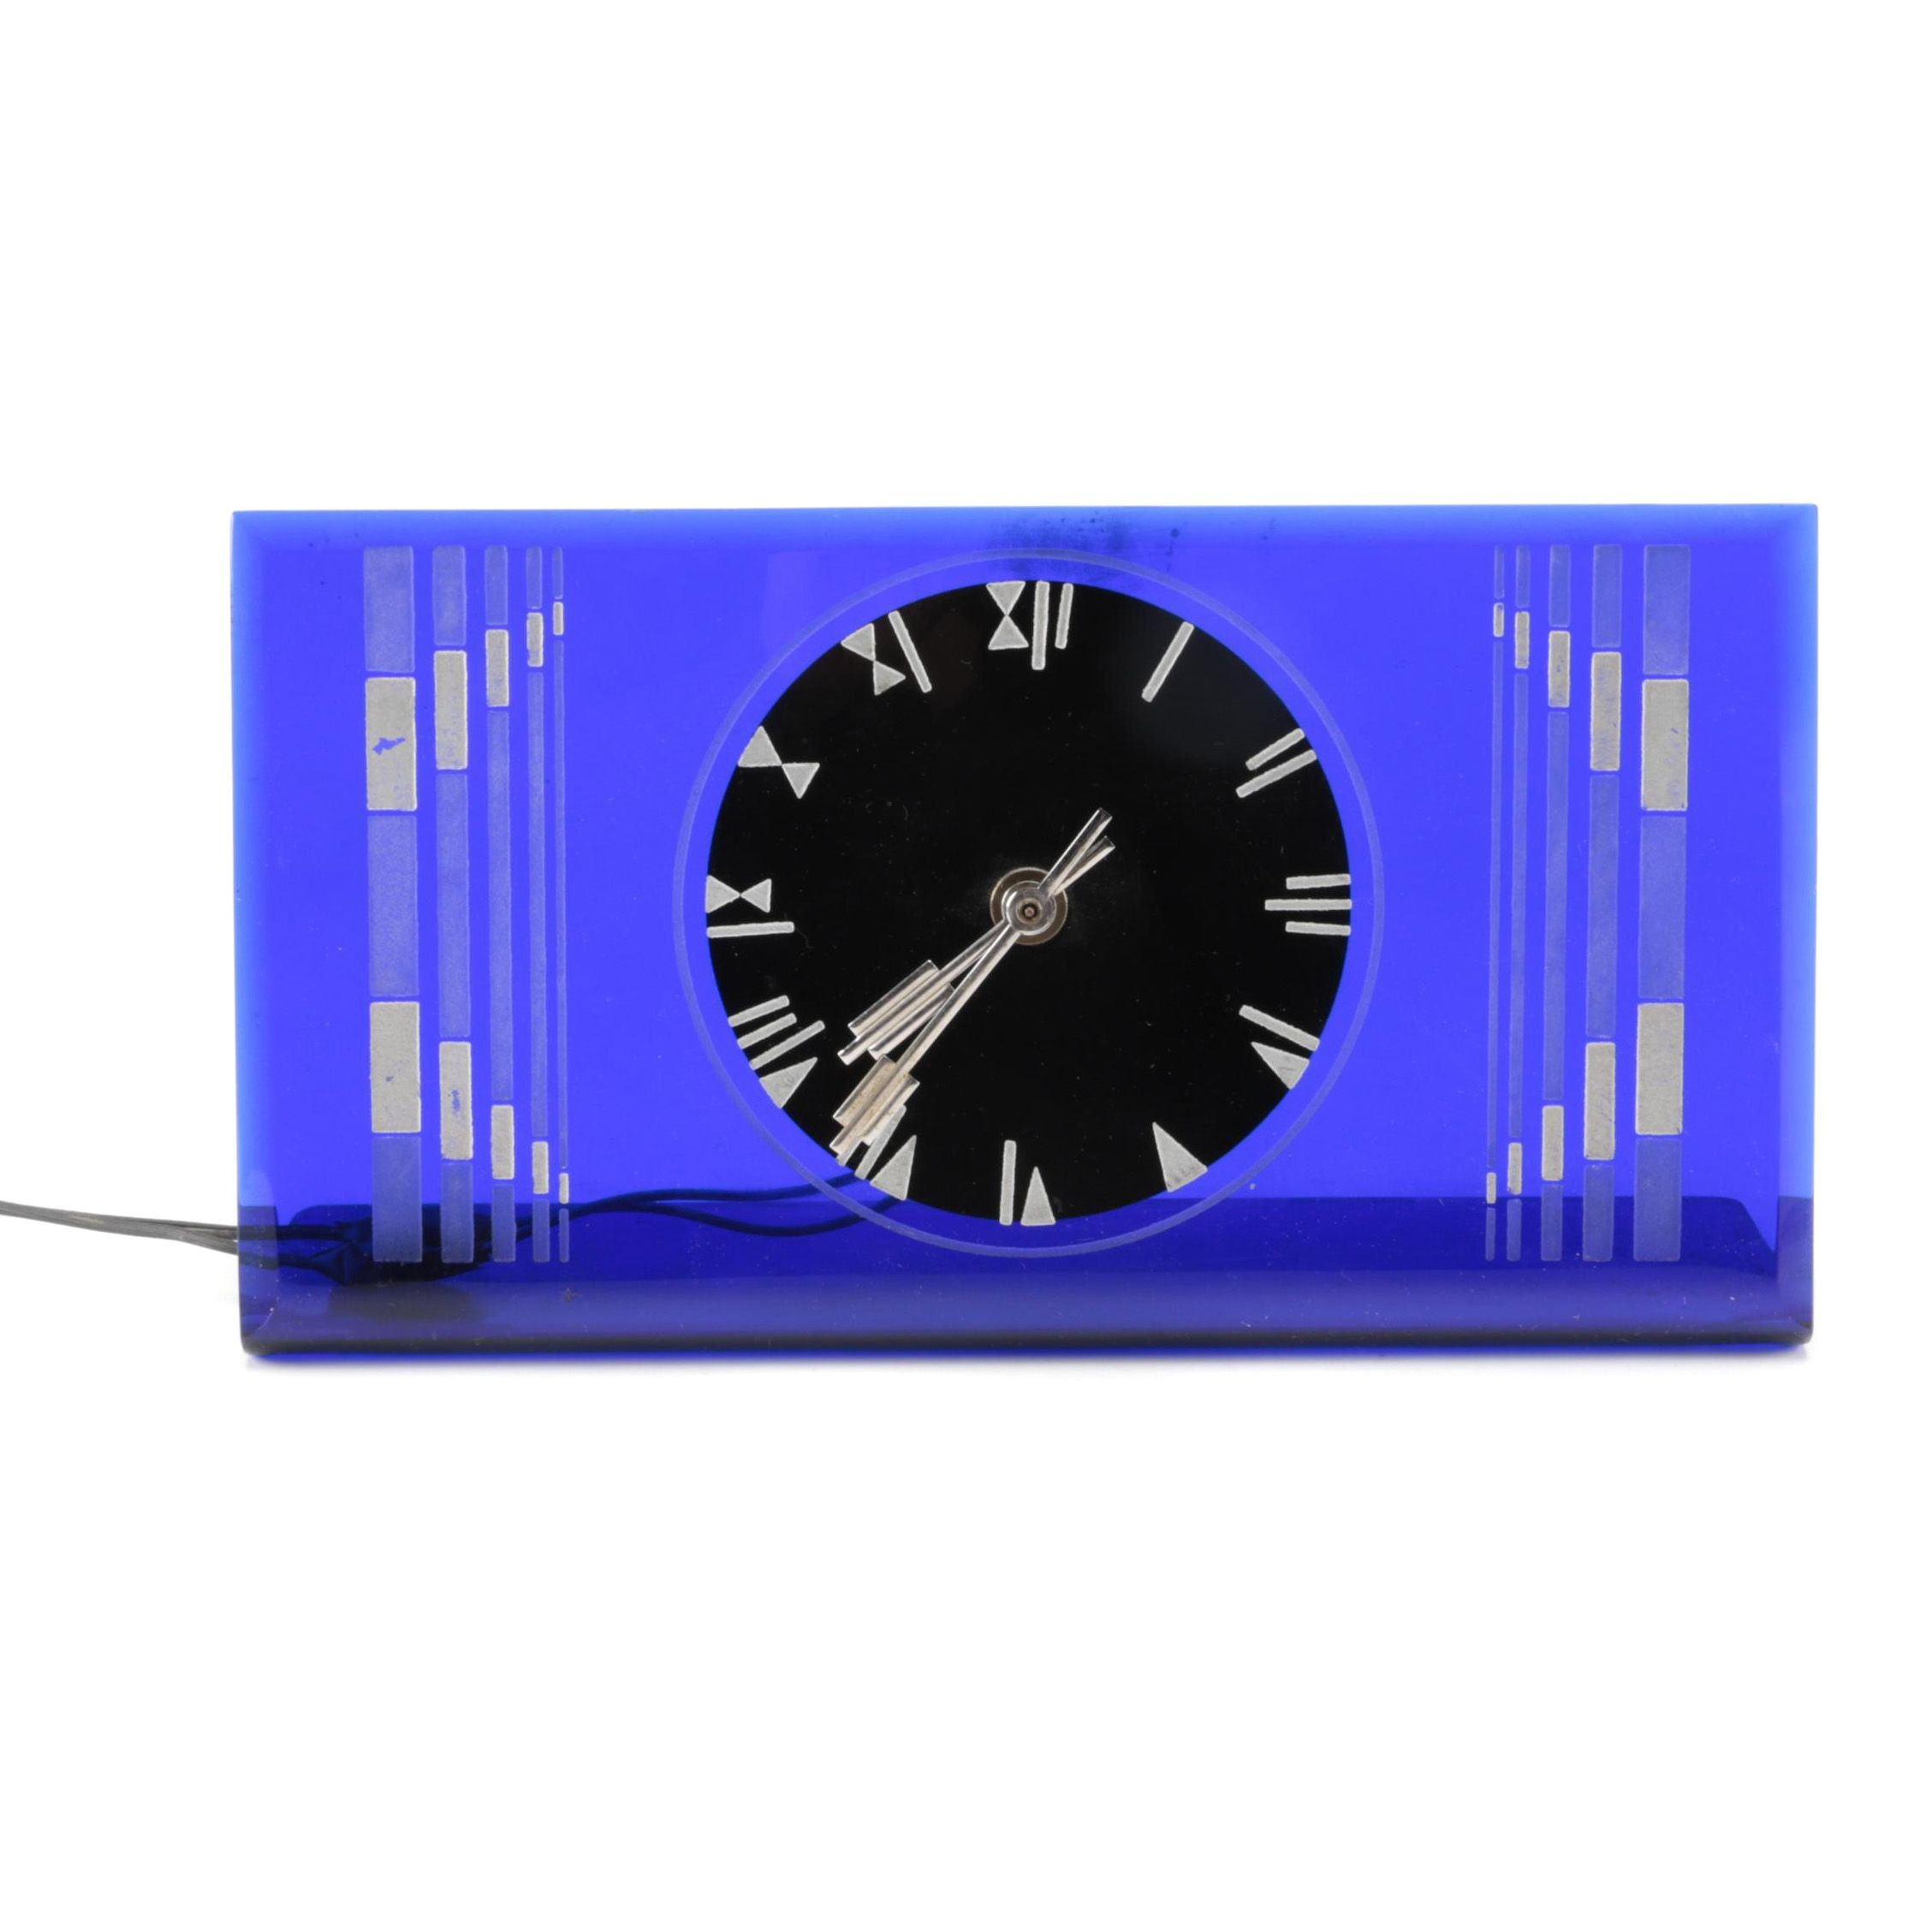 Vintage Synchron Art Deco Style Glass Mantel Clock